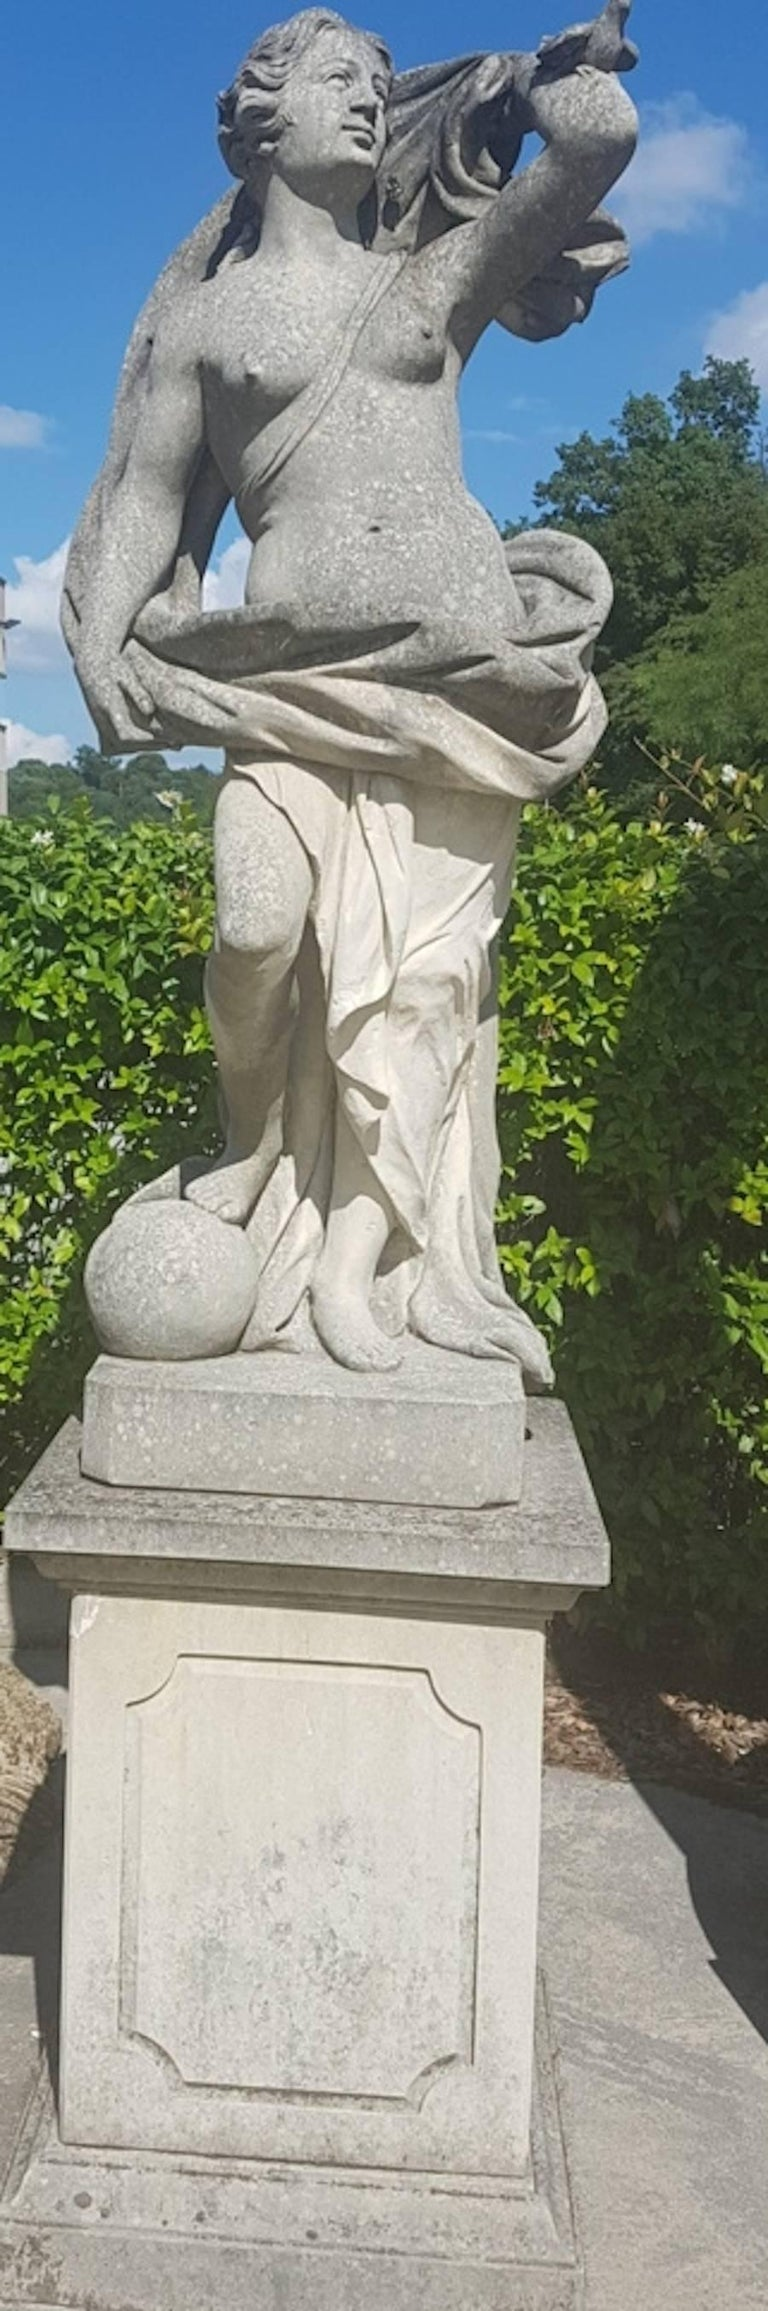 20th Century Two Italian Stone Garden Sculptures of Apollo and Roman Goddess For Sale